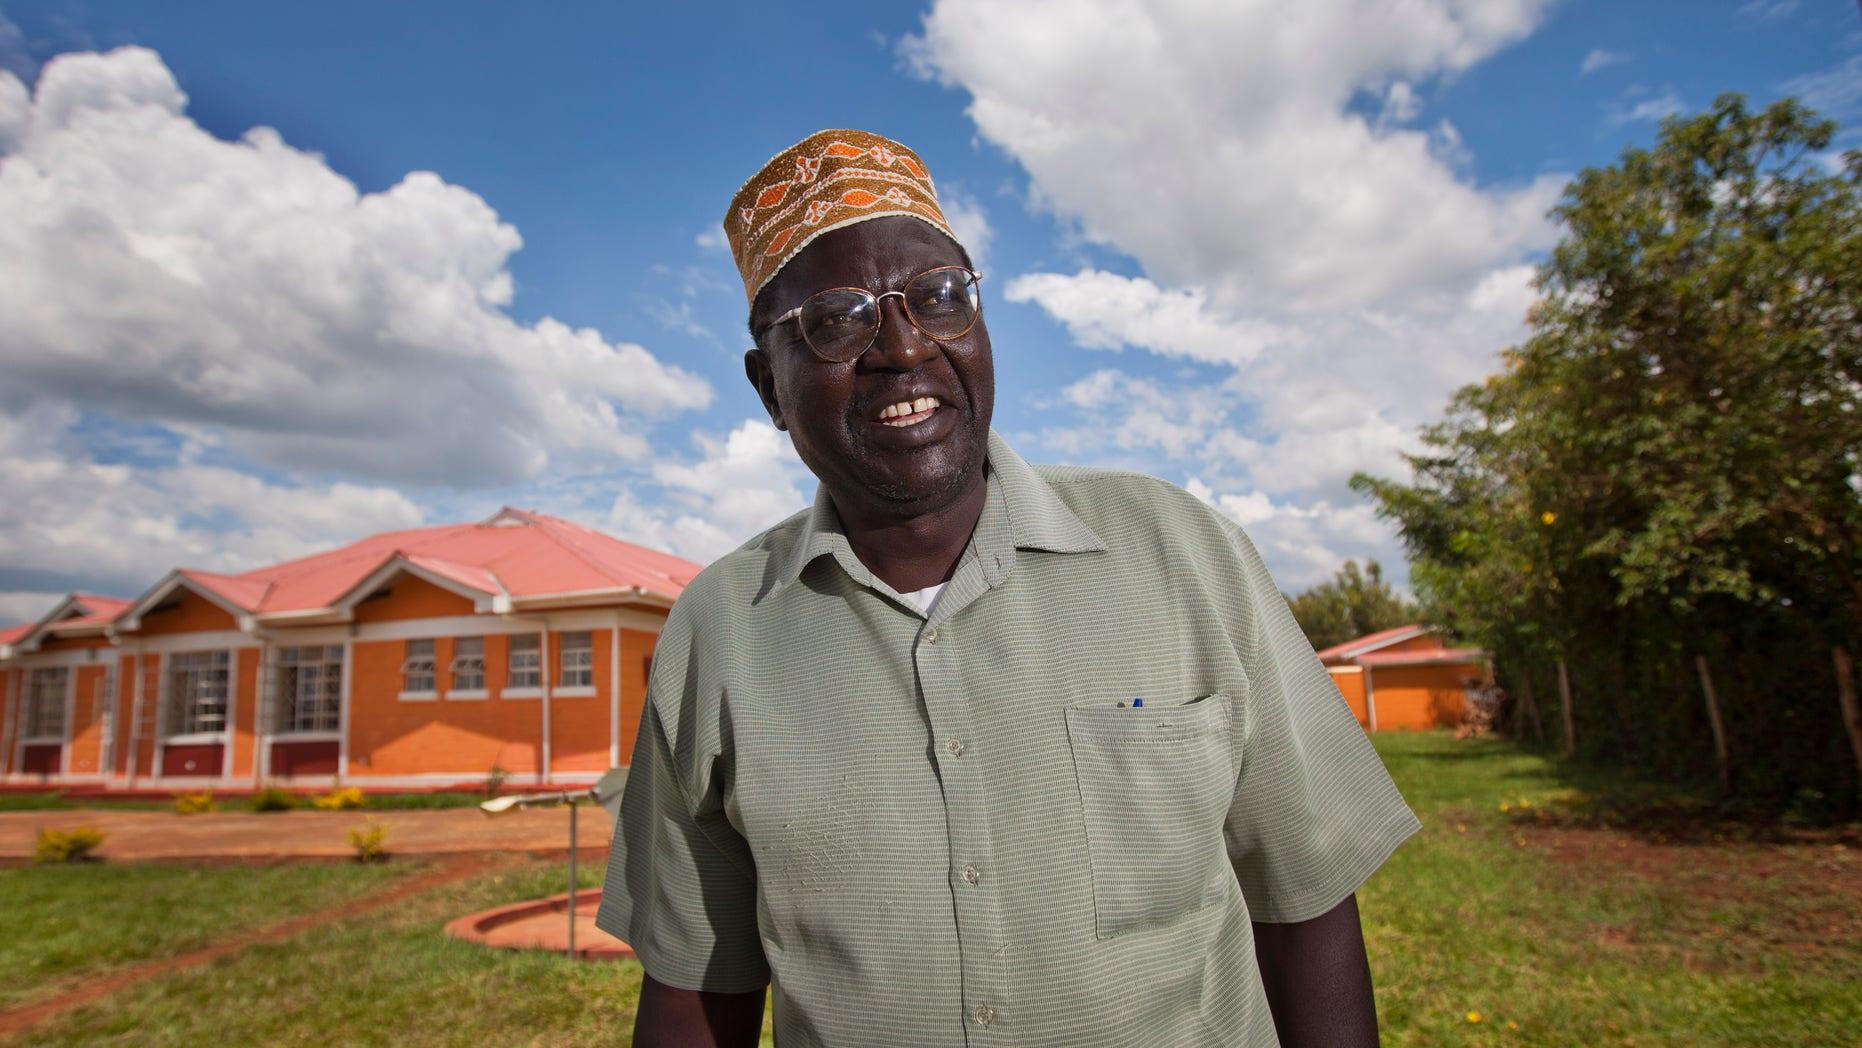 Nov. 4, 2012 - FILE  photo of Malik Obama, half-brother of President Barack Obama, in western Kenya.